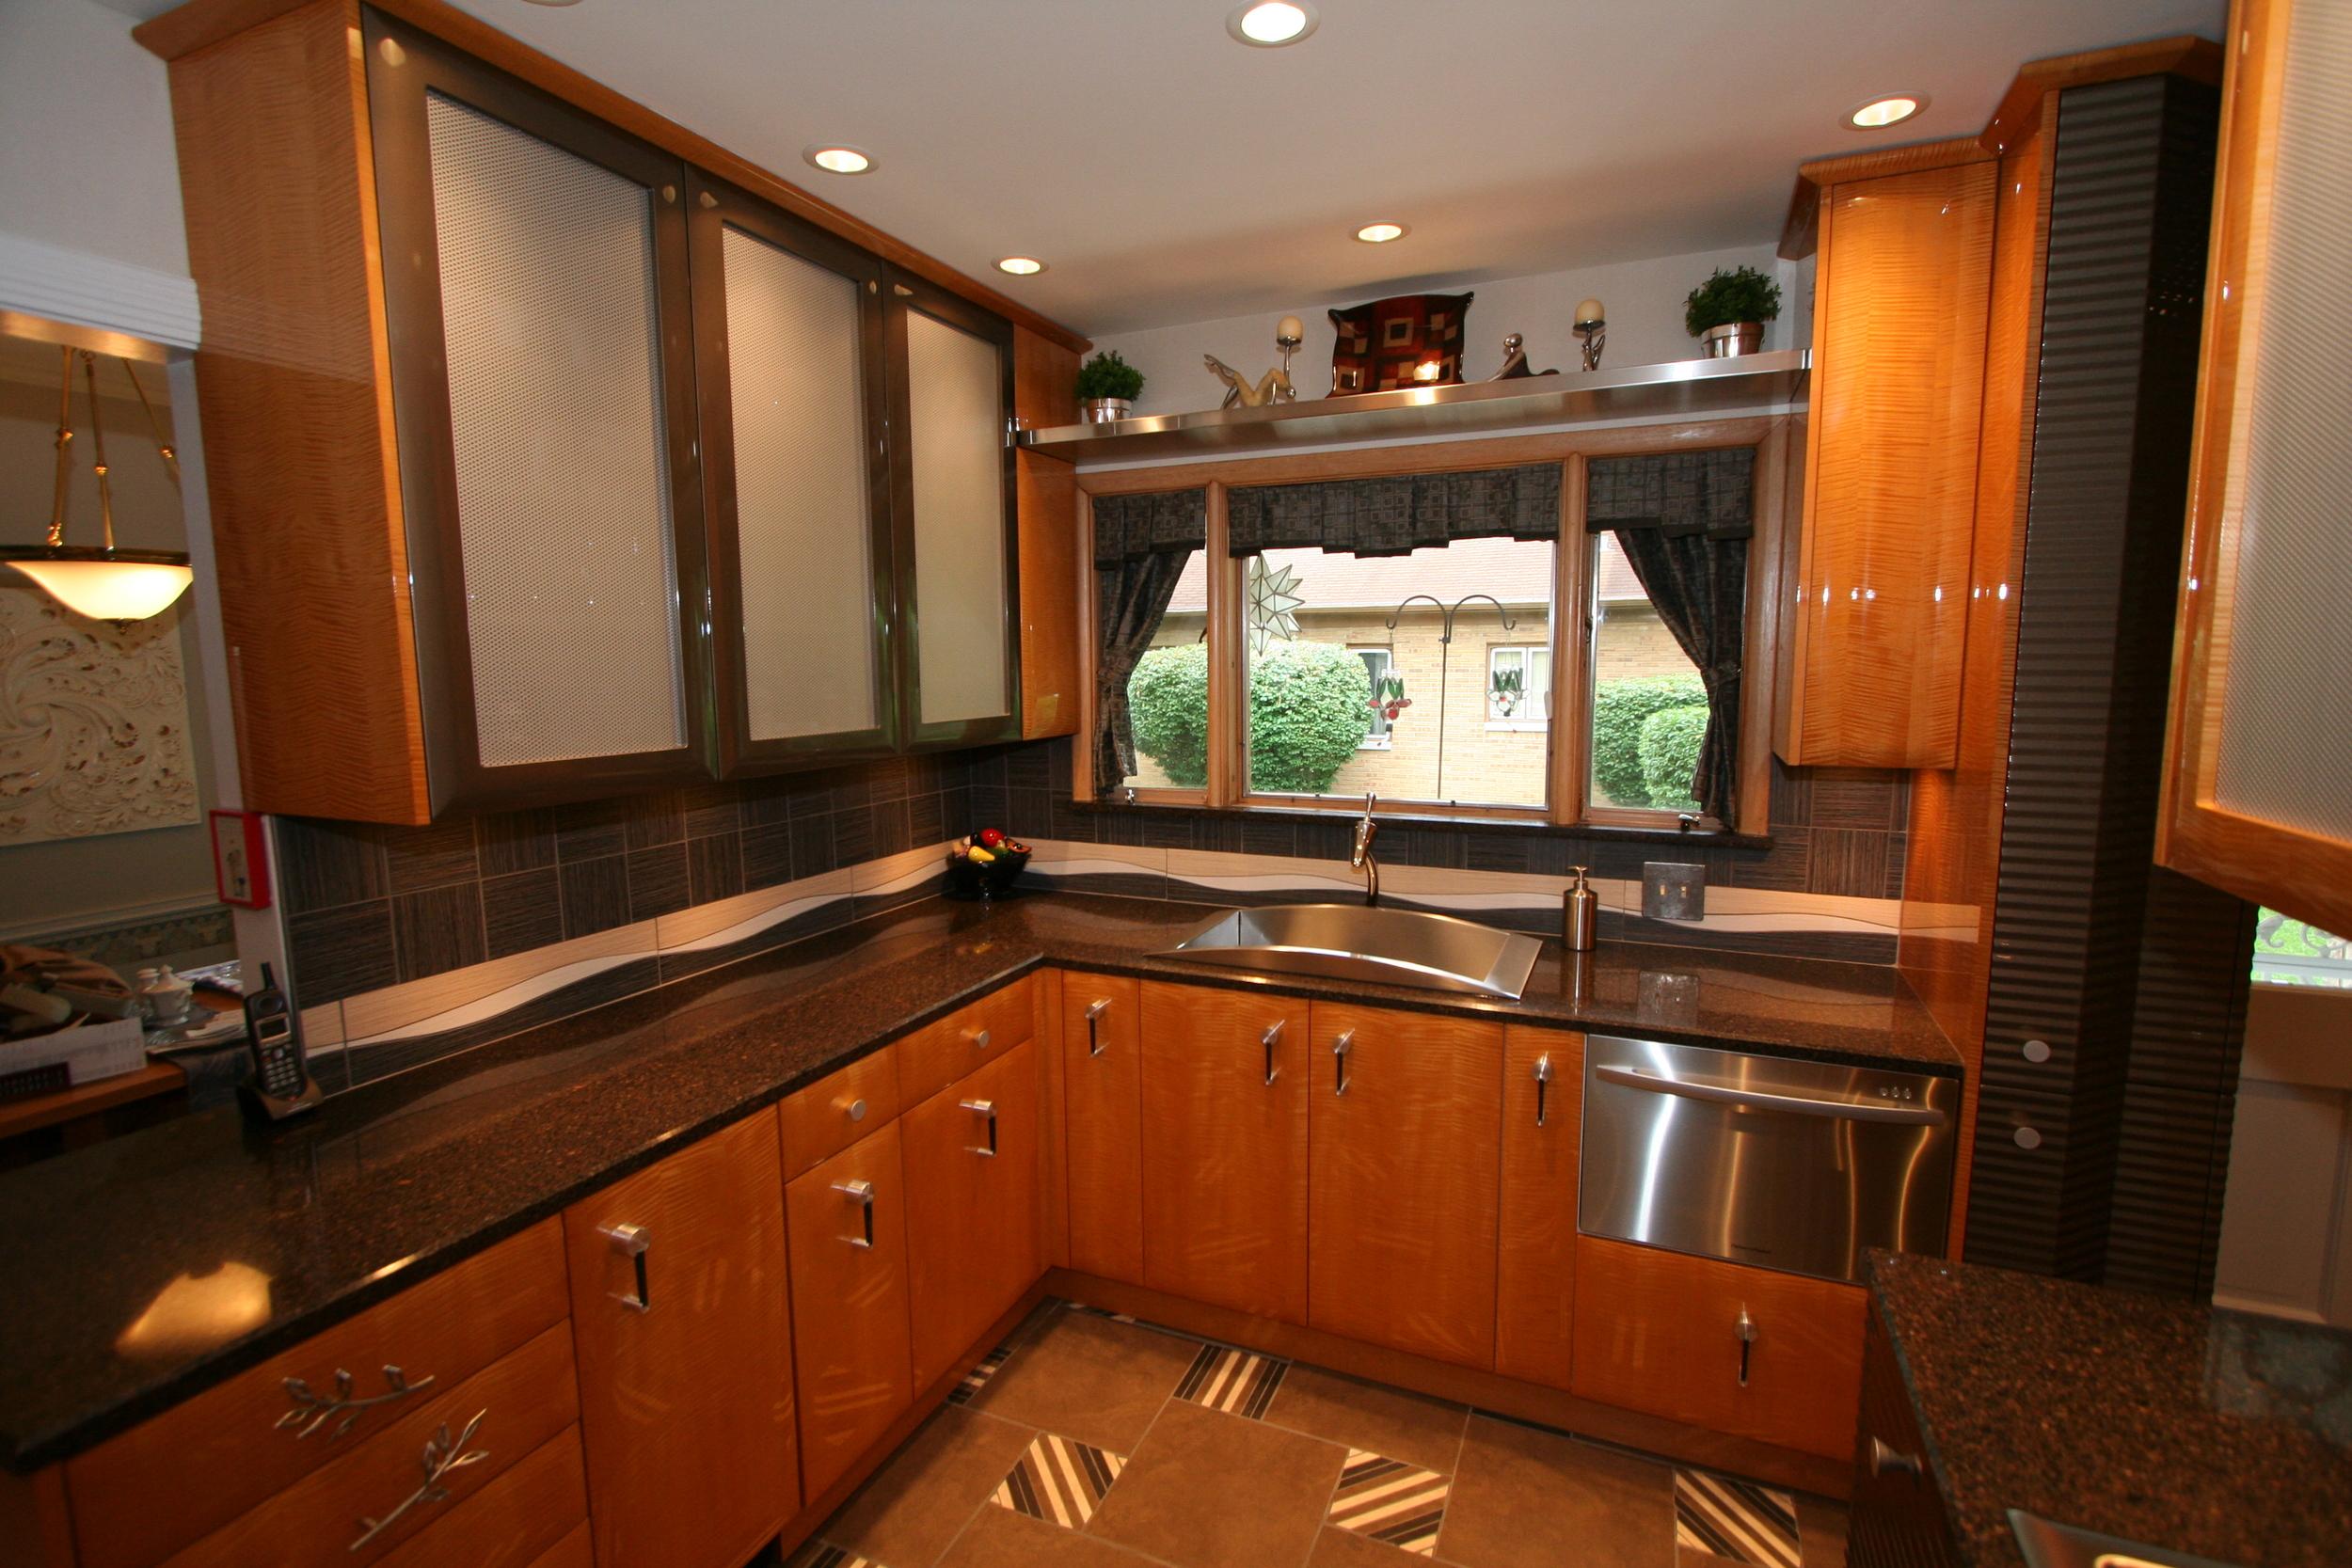 kitchens w McCreary kitchen 2.jpg